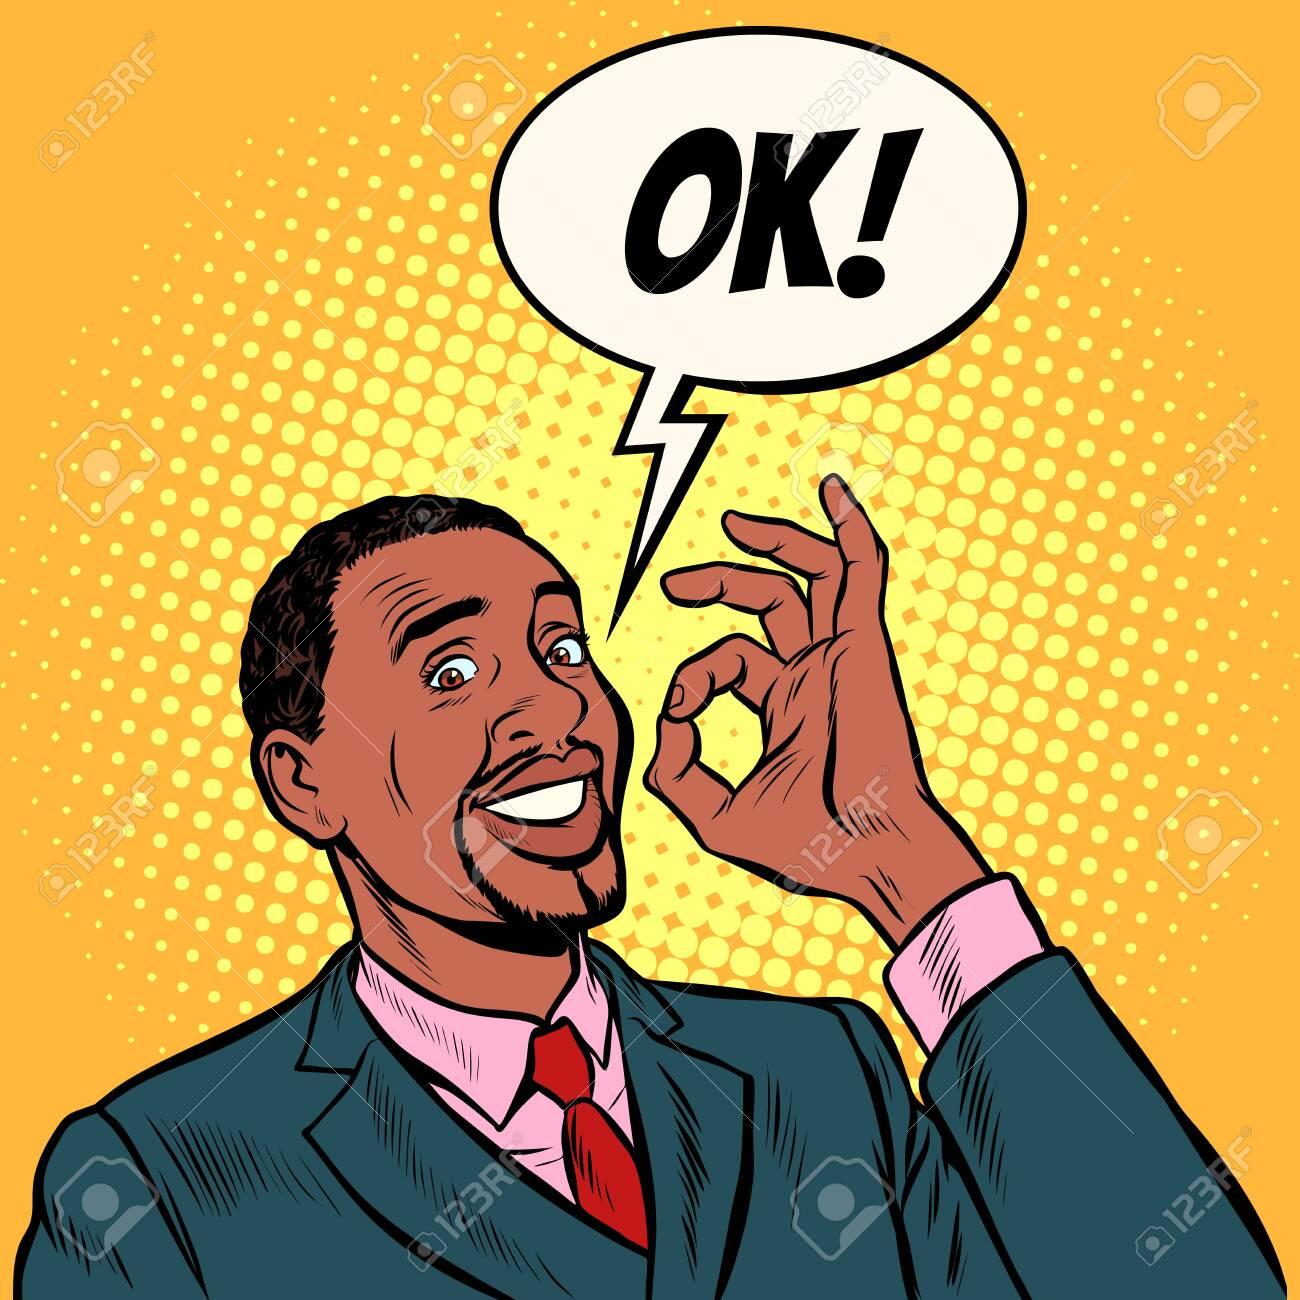 OK african man businessman. hand gesture okay. success good. Pop art retro vector illustration vintage kitsch 50s 60s - 124011159